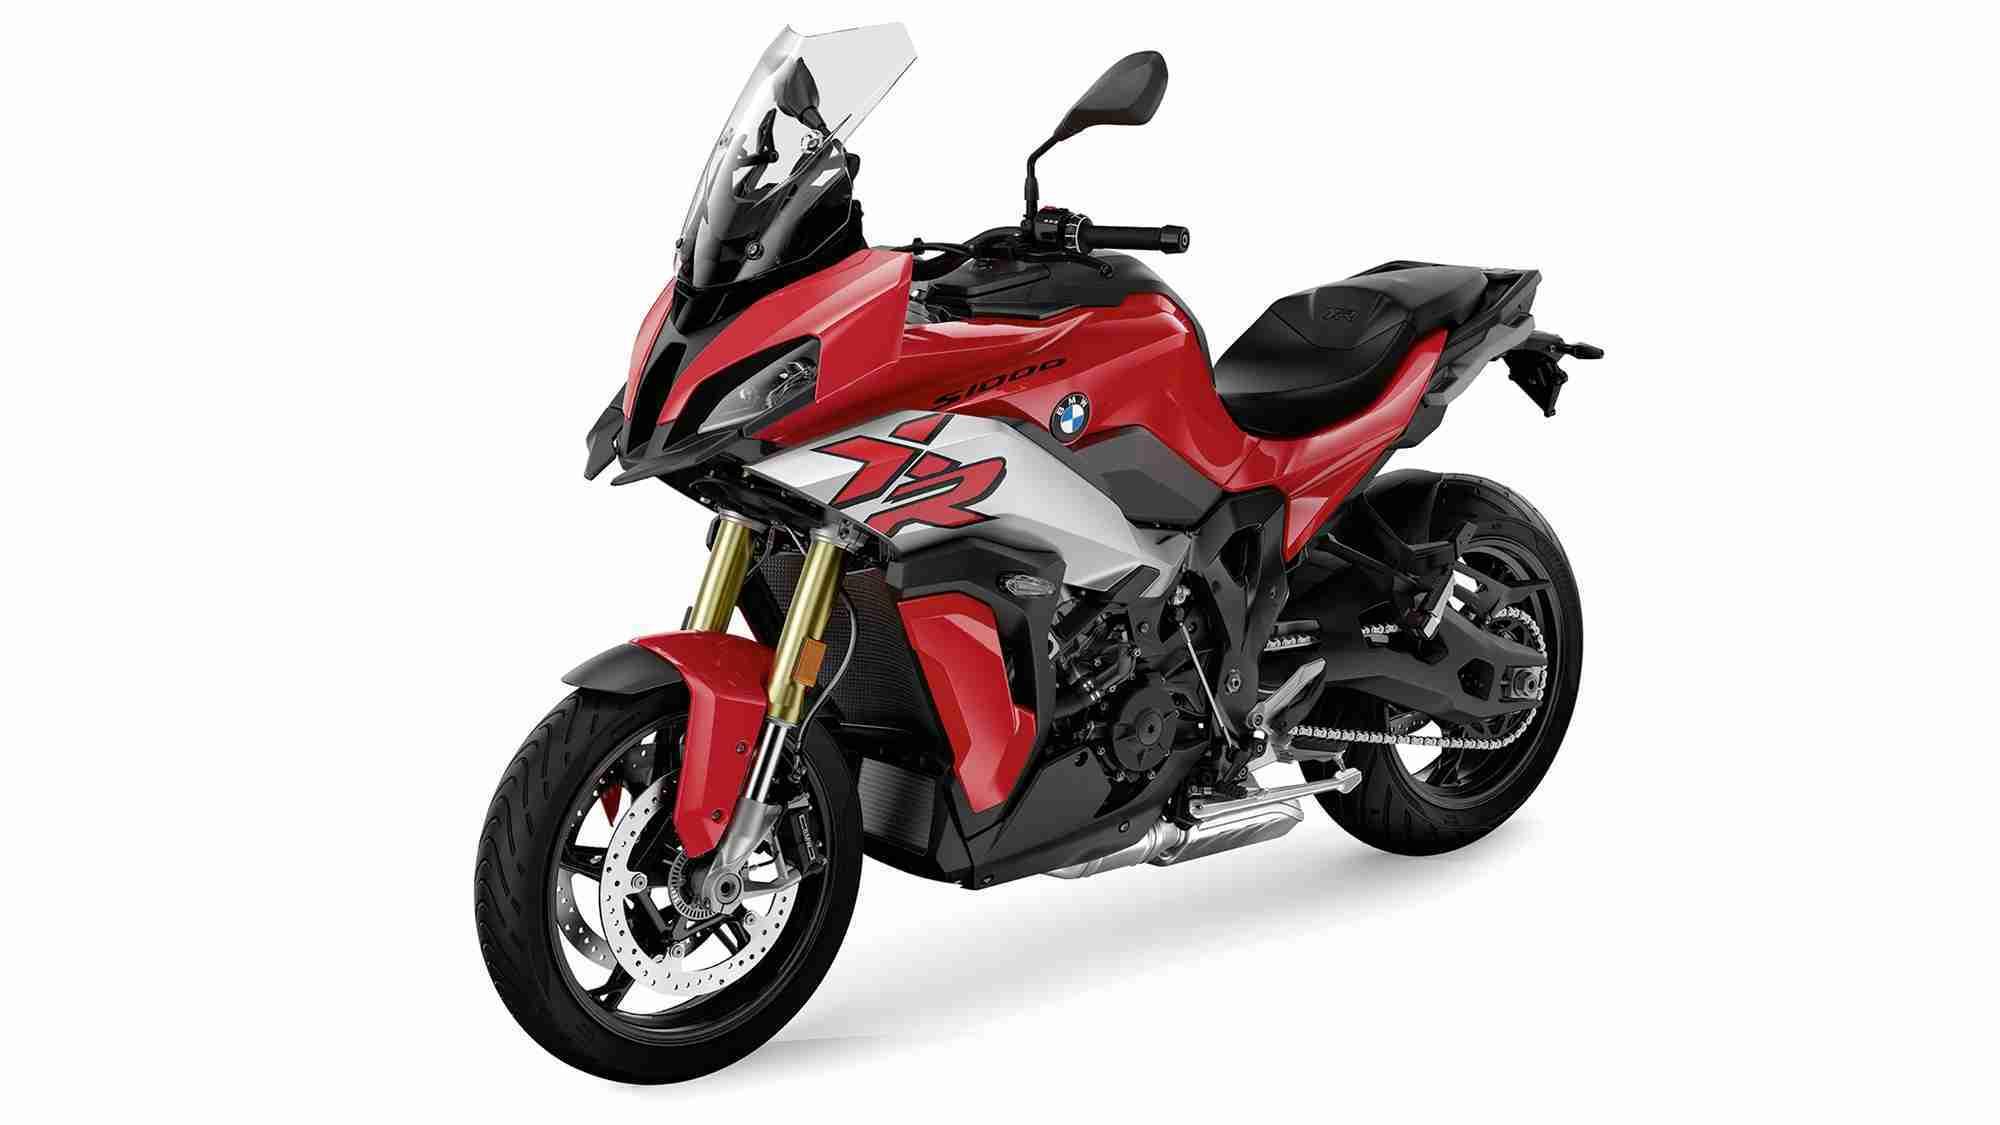 2020 bmw s1000 xr - red colour option   iamabiker